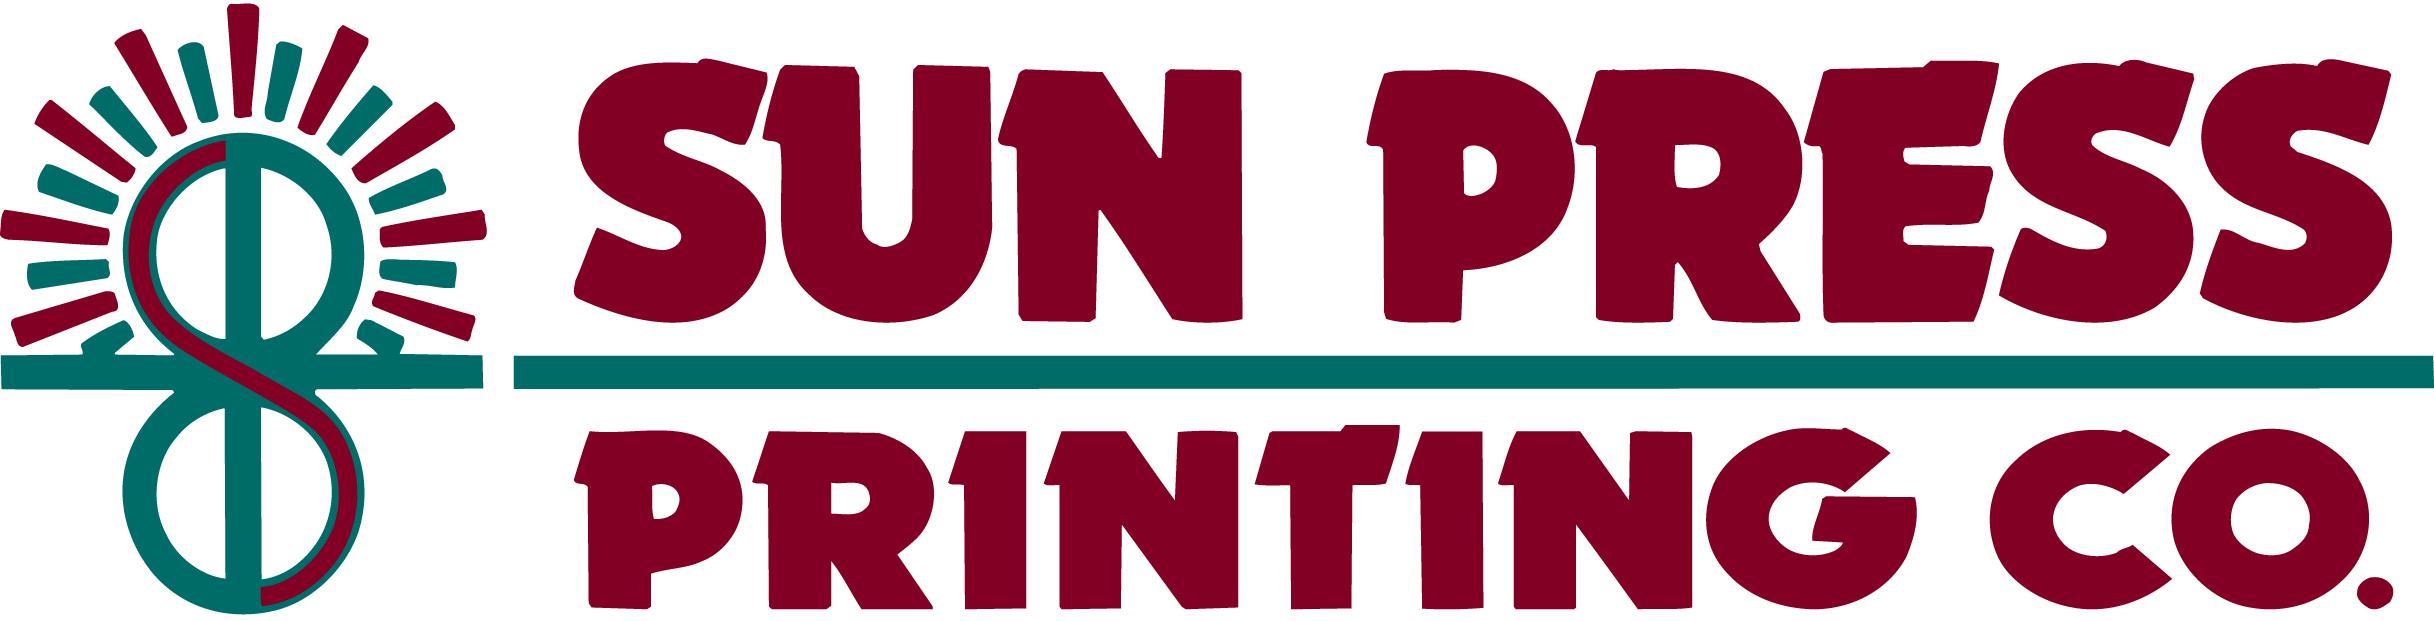 Sun Press Printing